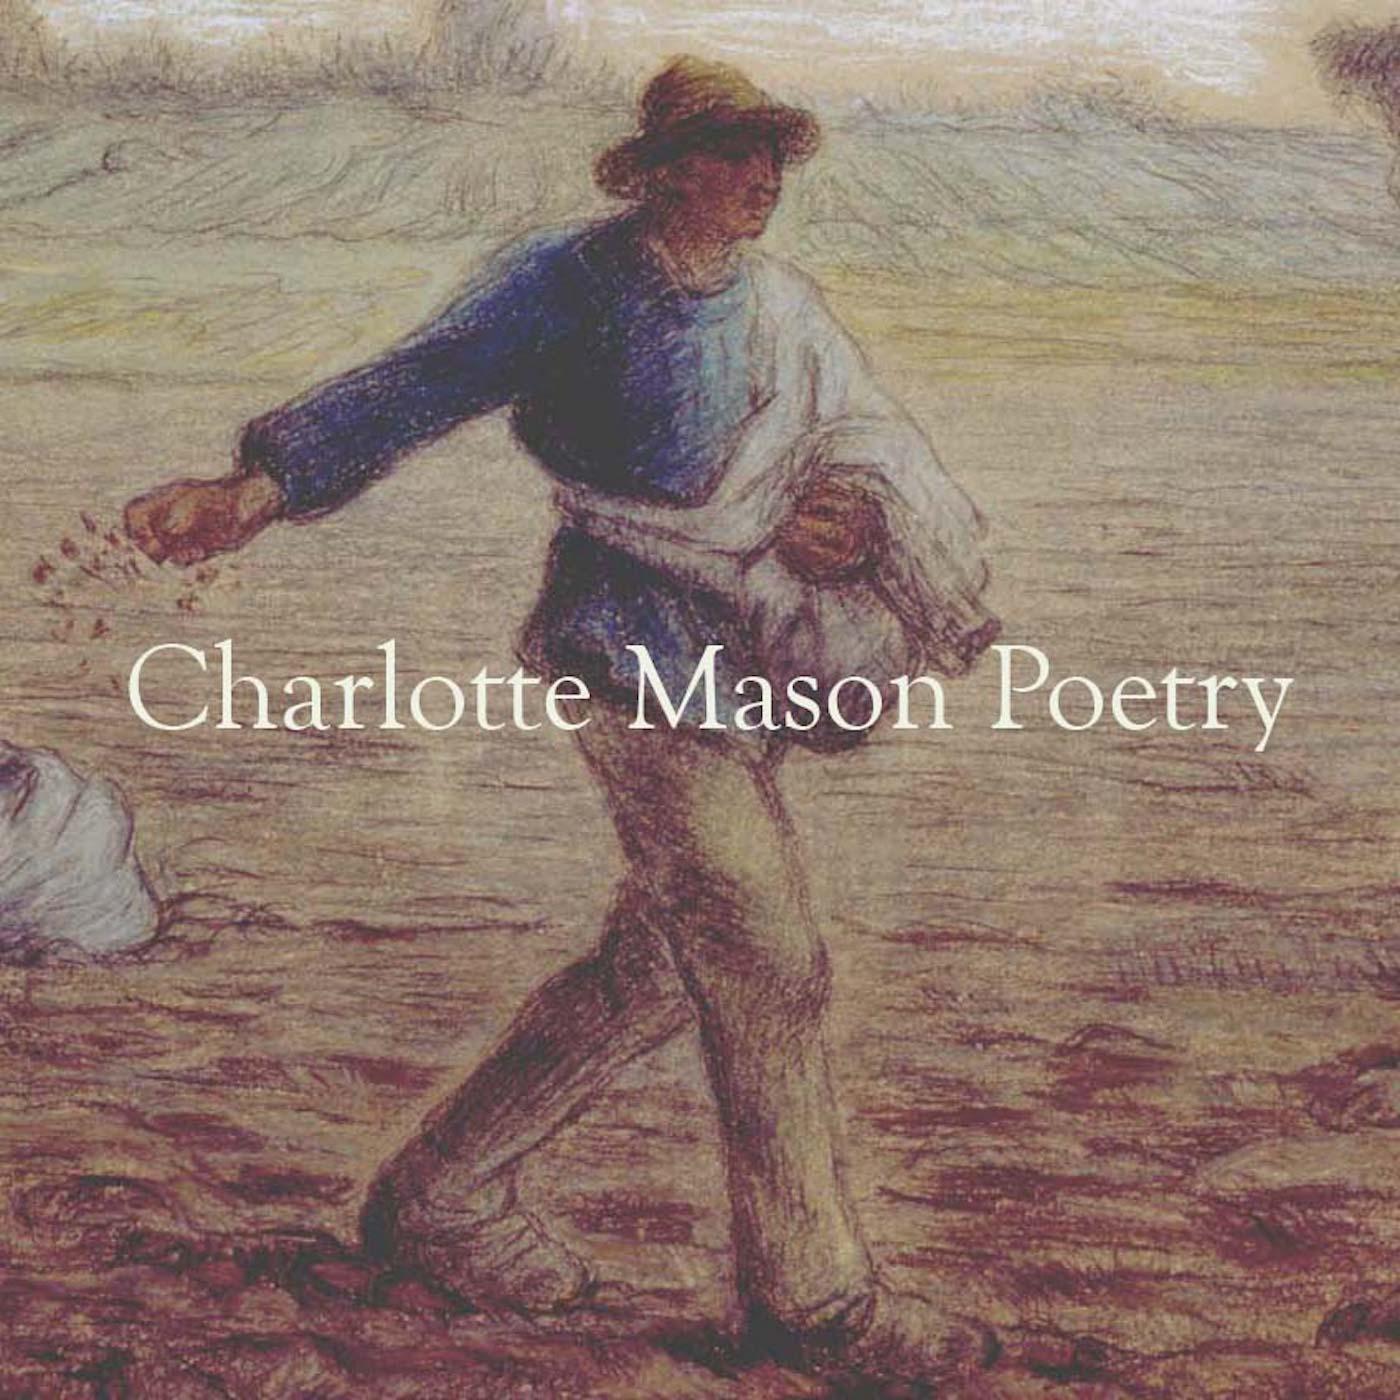 Charlotte Mason Poetry